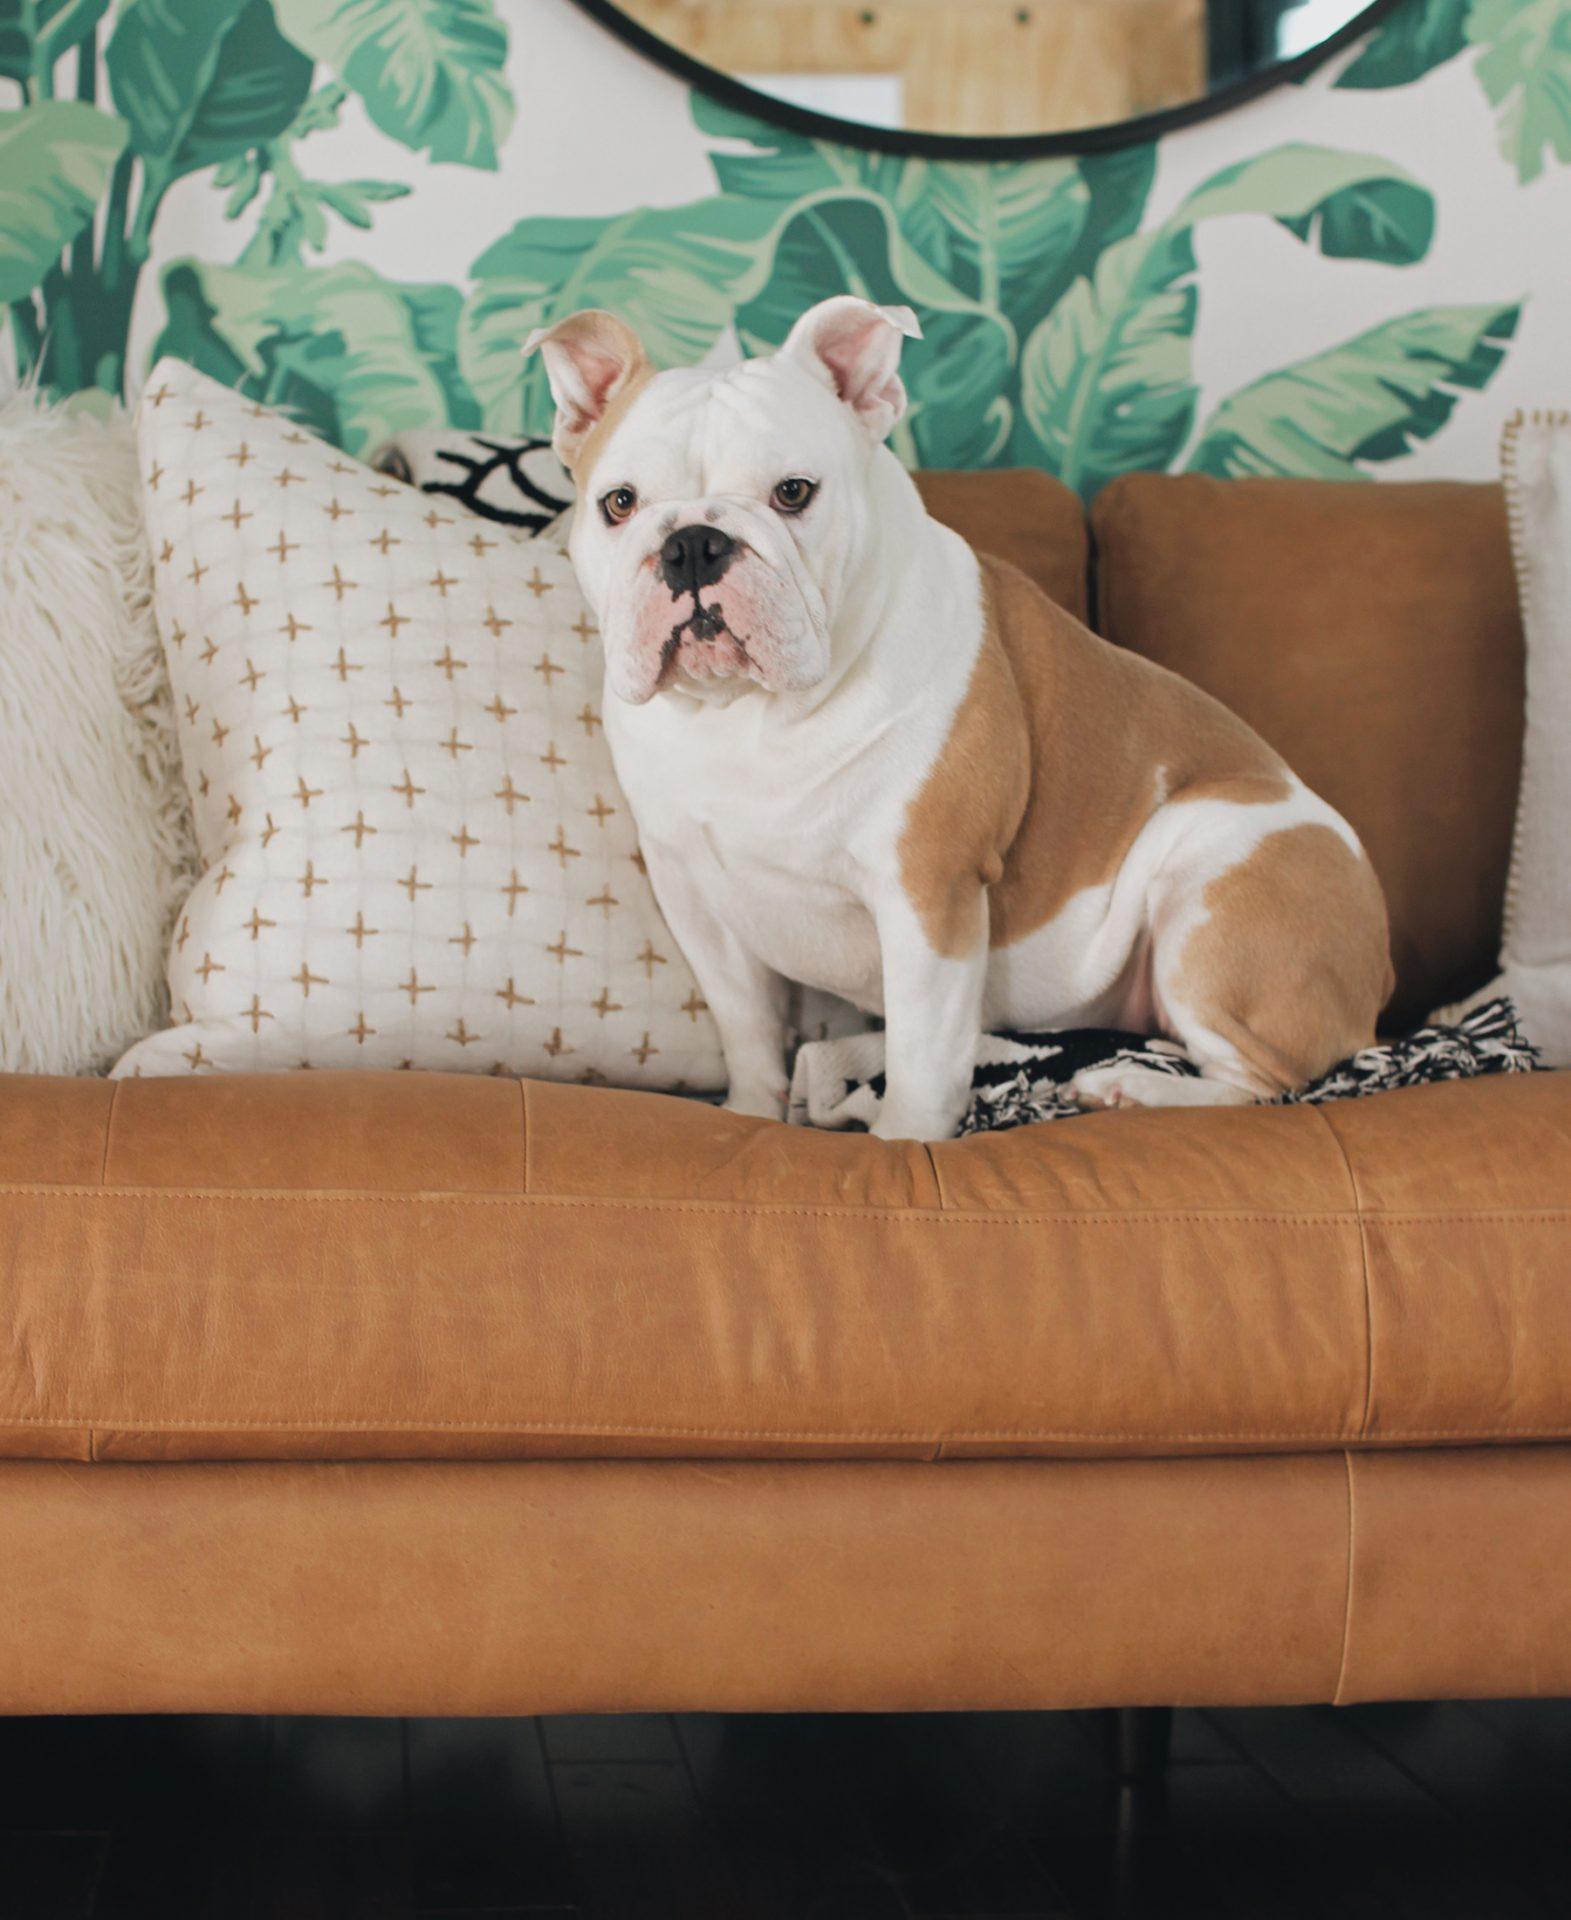 Rachel Metz's bulldog sits on the Article Sven sofa